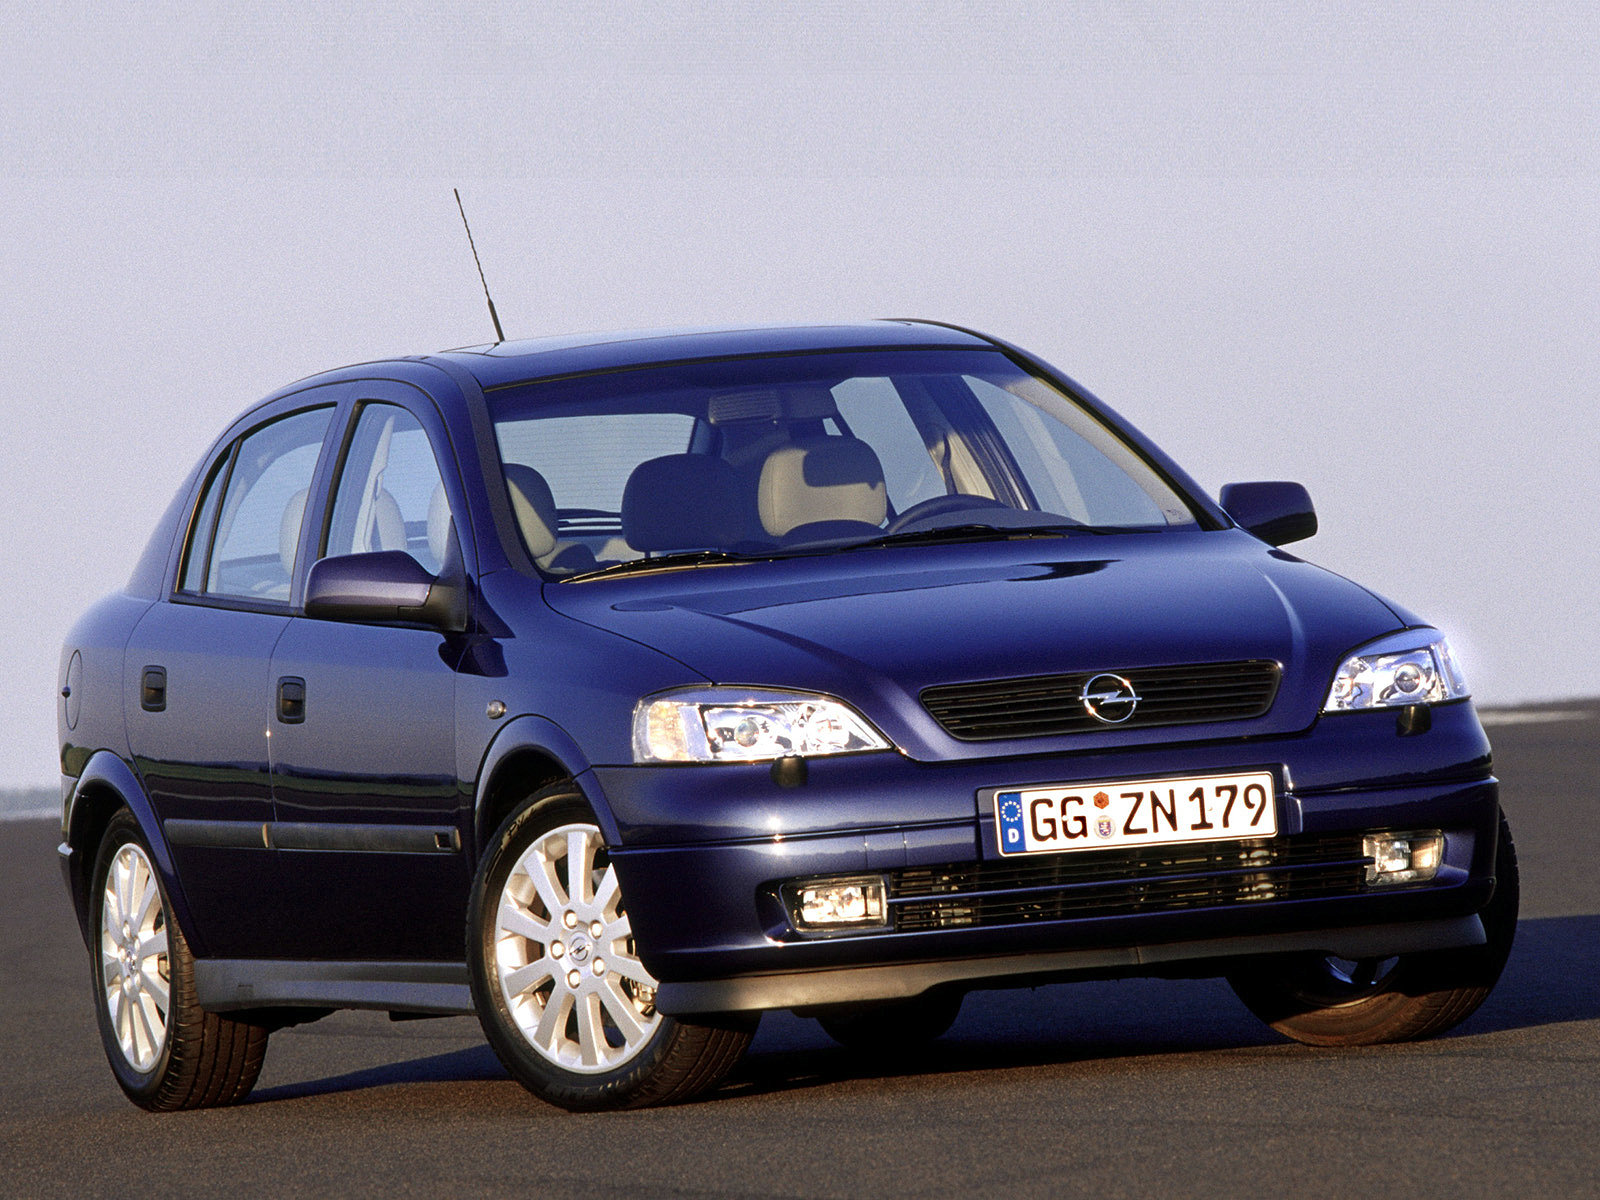 Volkswagen Golf Mk IV VS Opel Astra G: с кем на Руси жить веселей?